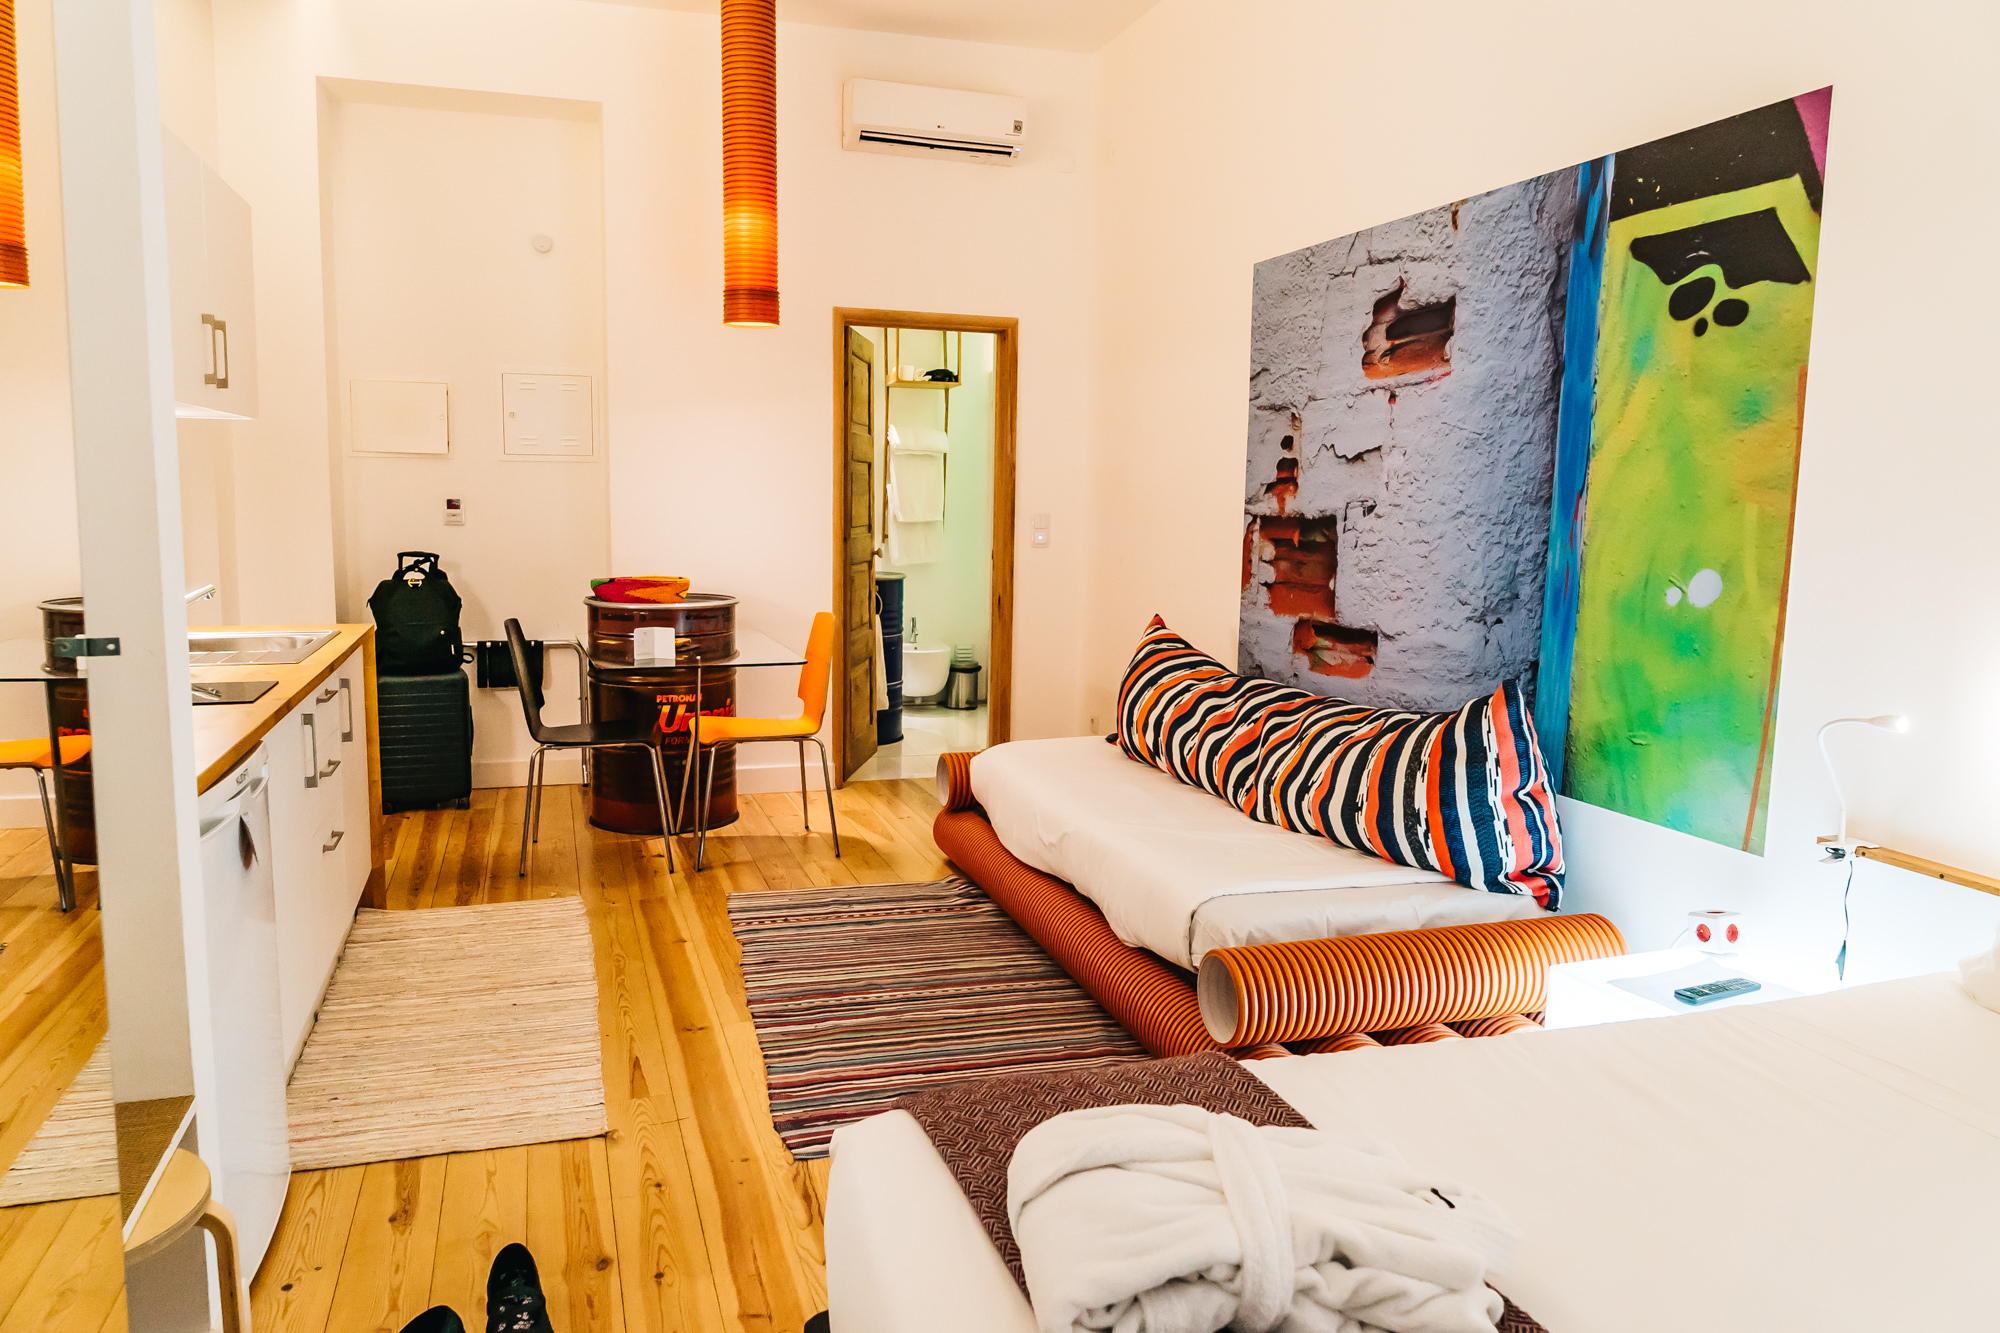 Chiado Arty Flats #Lisbon #Portugal #hotel